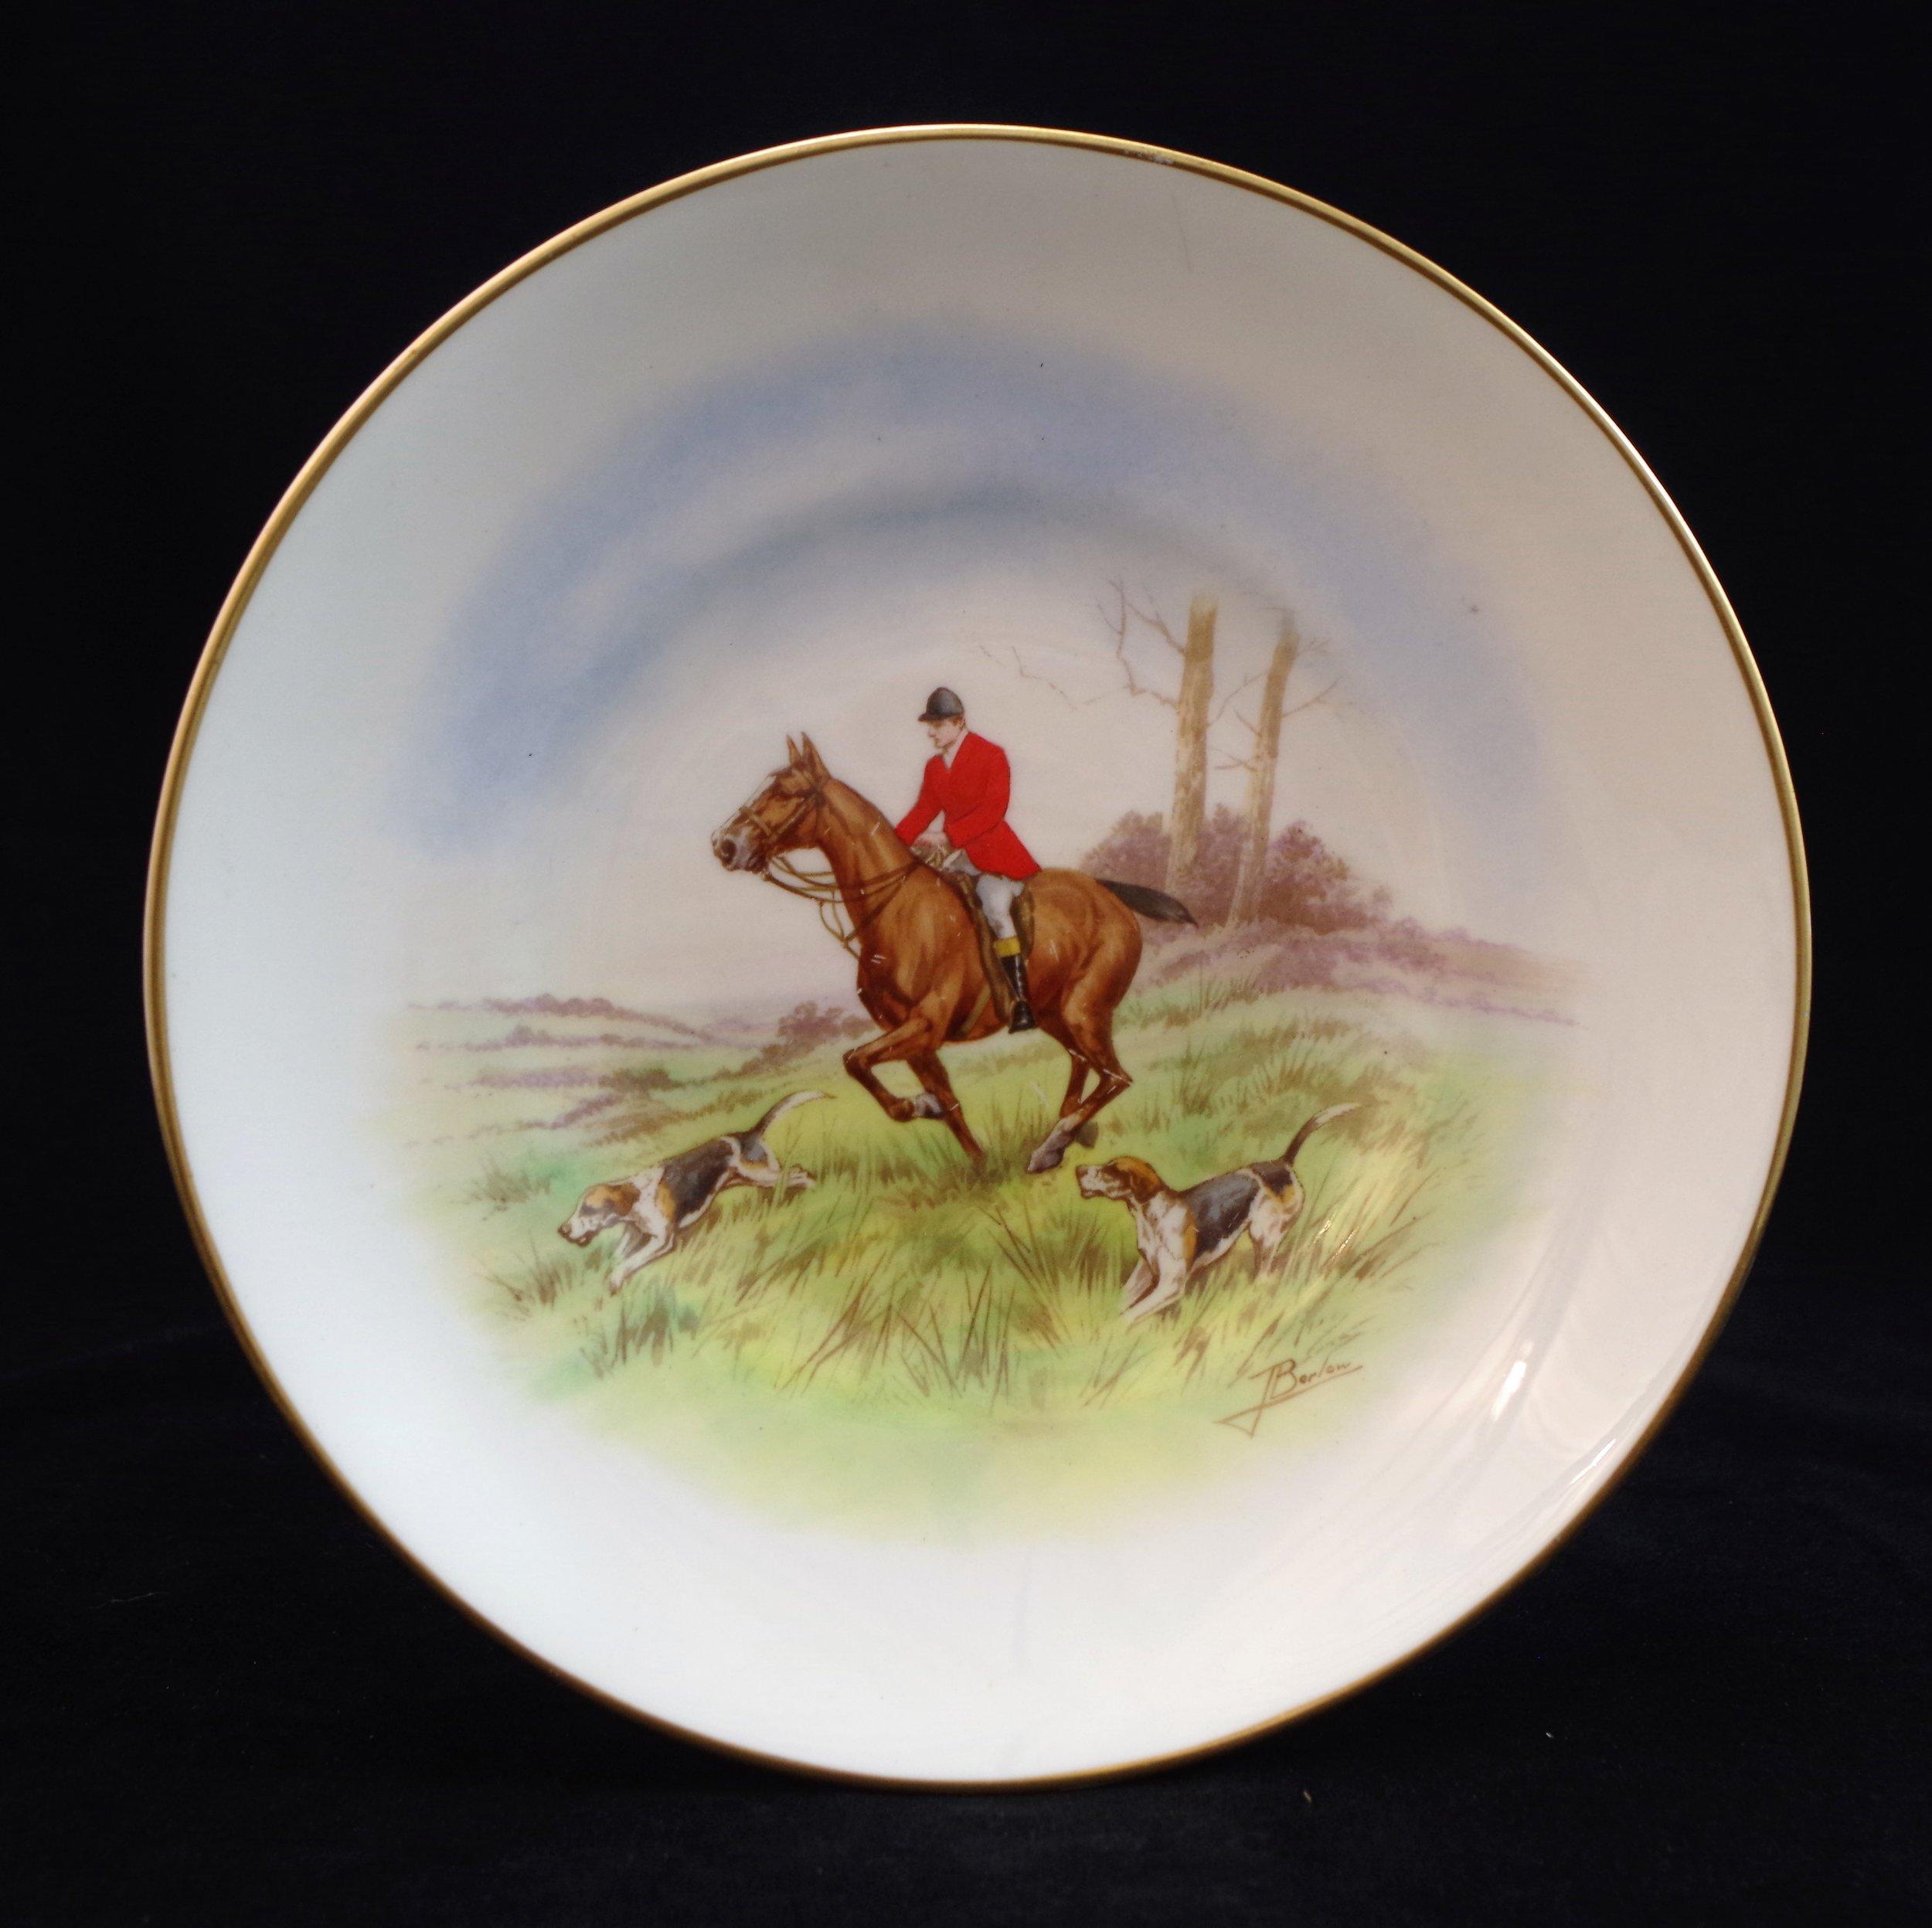 royal-crown-derby-large-breakfast-cup-saucer-J-barlow